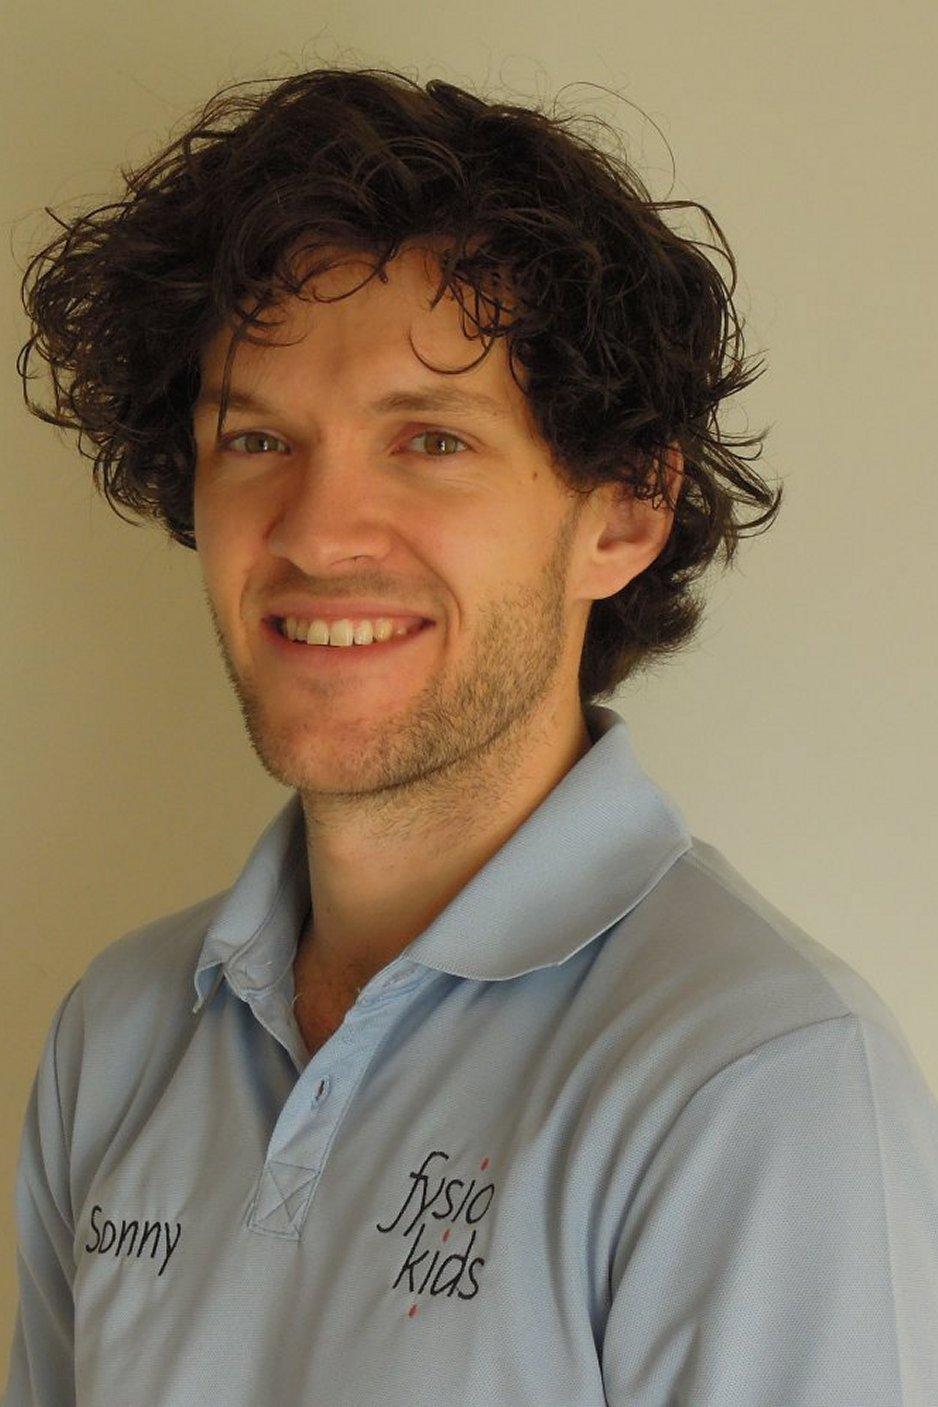 Sonny Verspoor : Kinderfysiotherapeut <br><br><br>